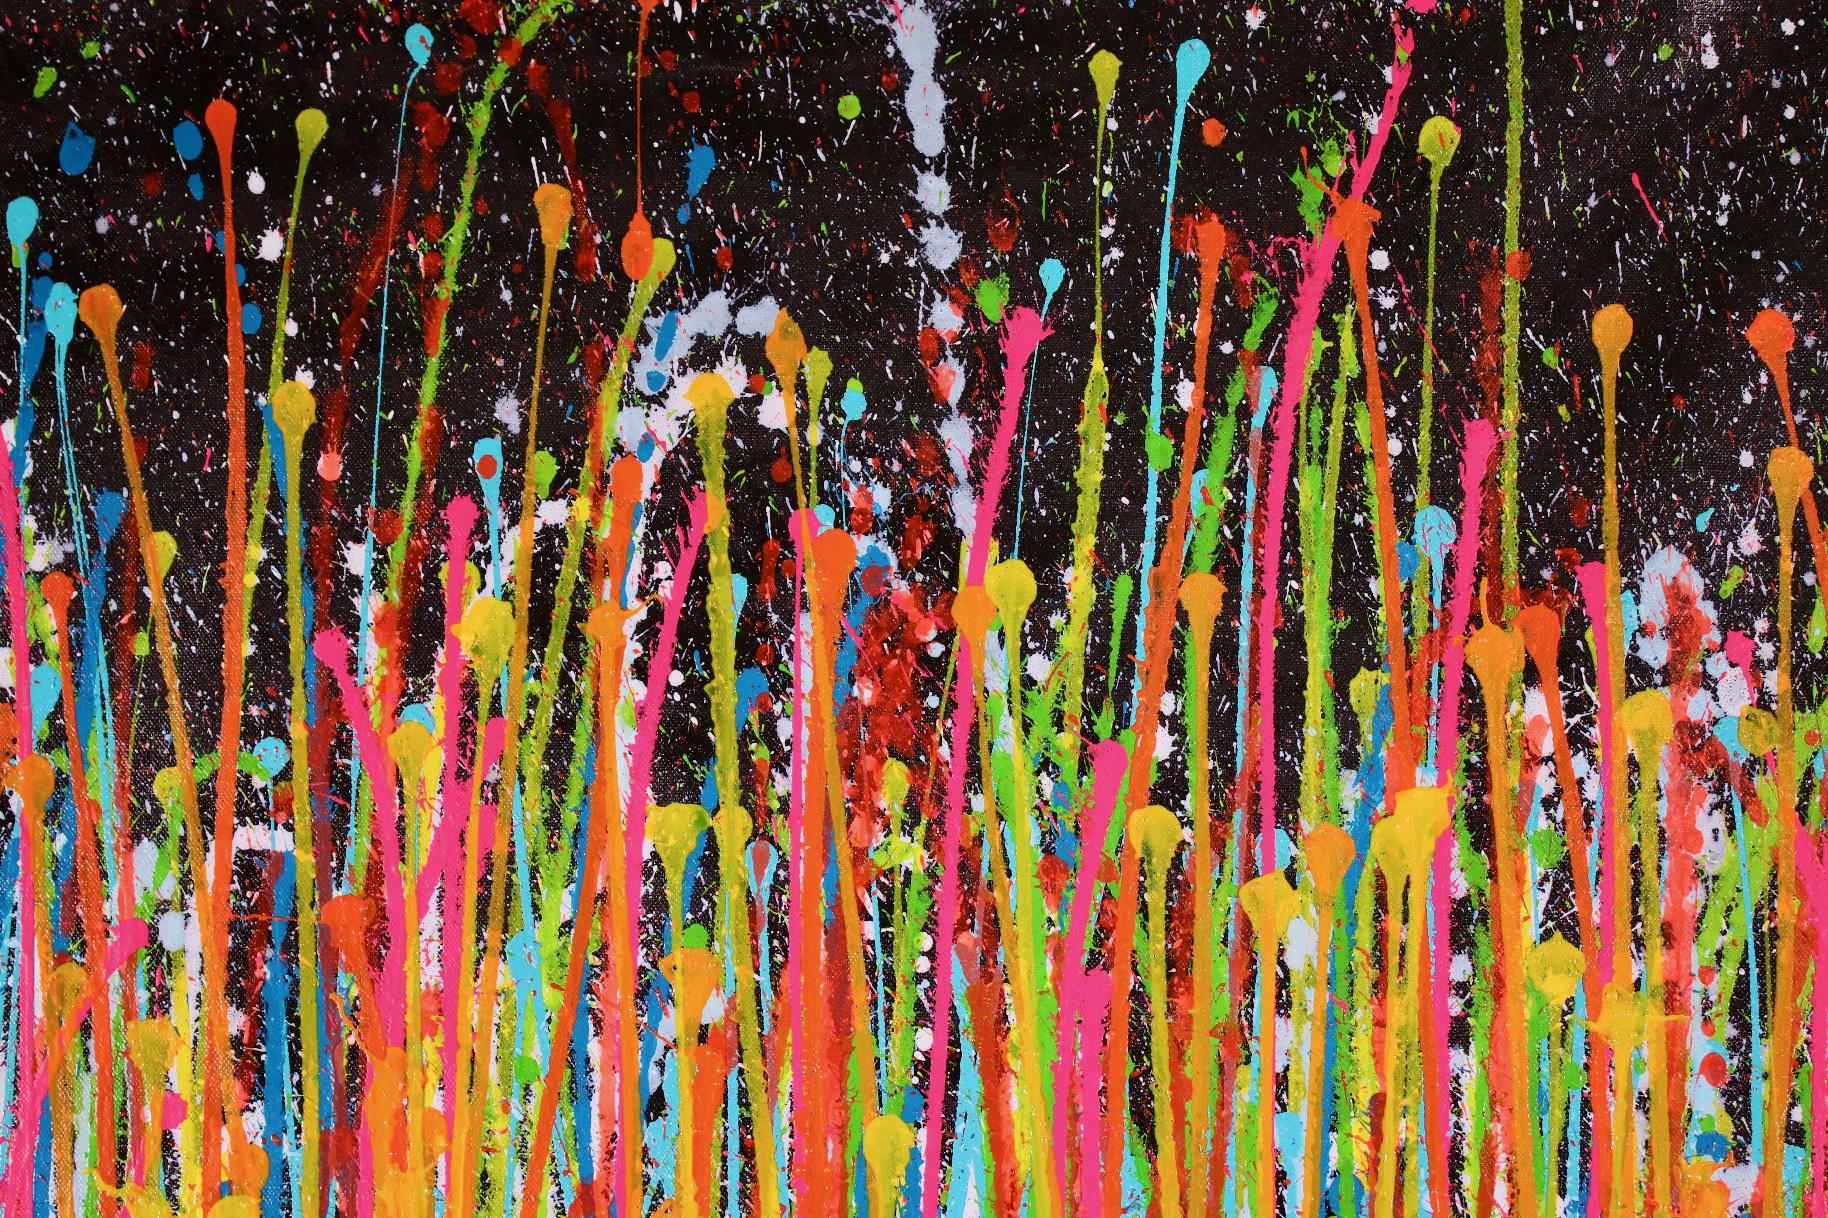 Consciousness Garden 2 - (2019) Abstract Acrylic painting by Nestor Toro